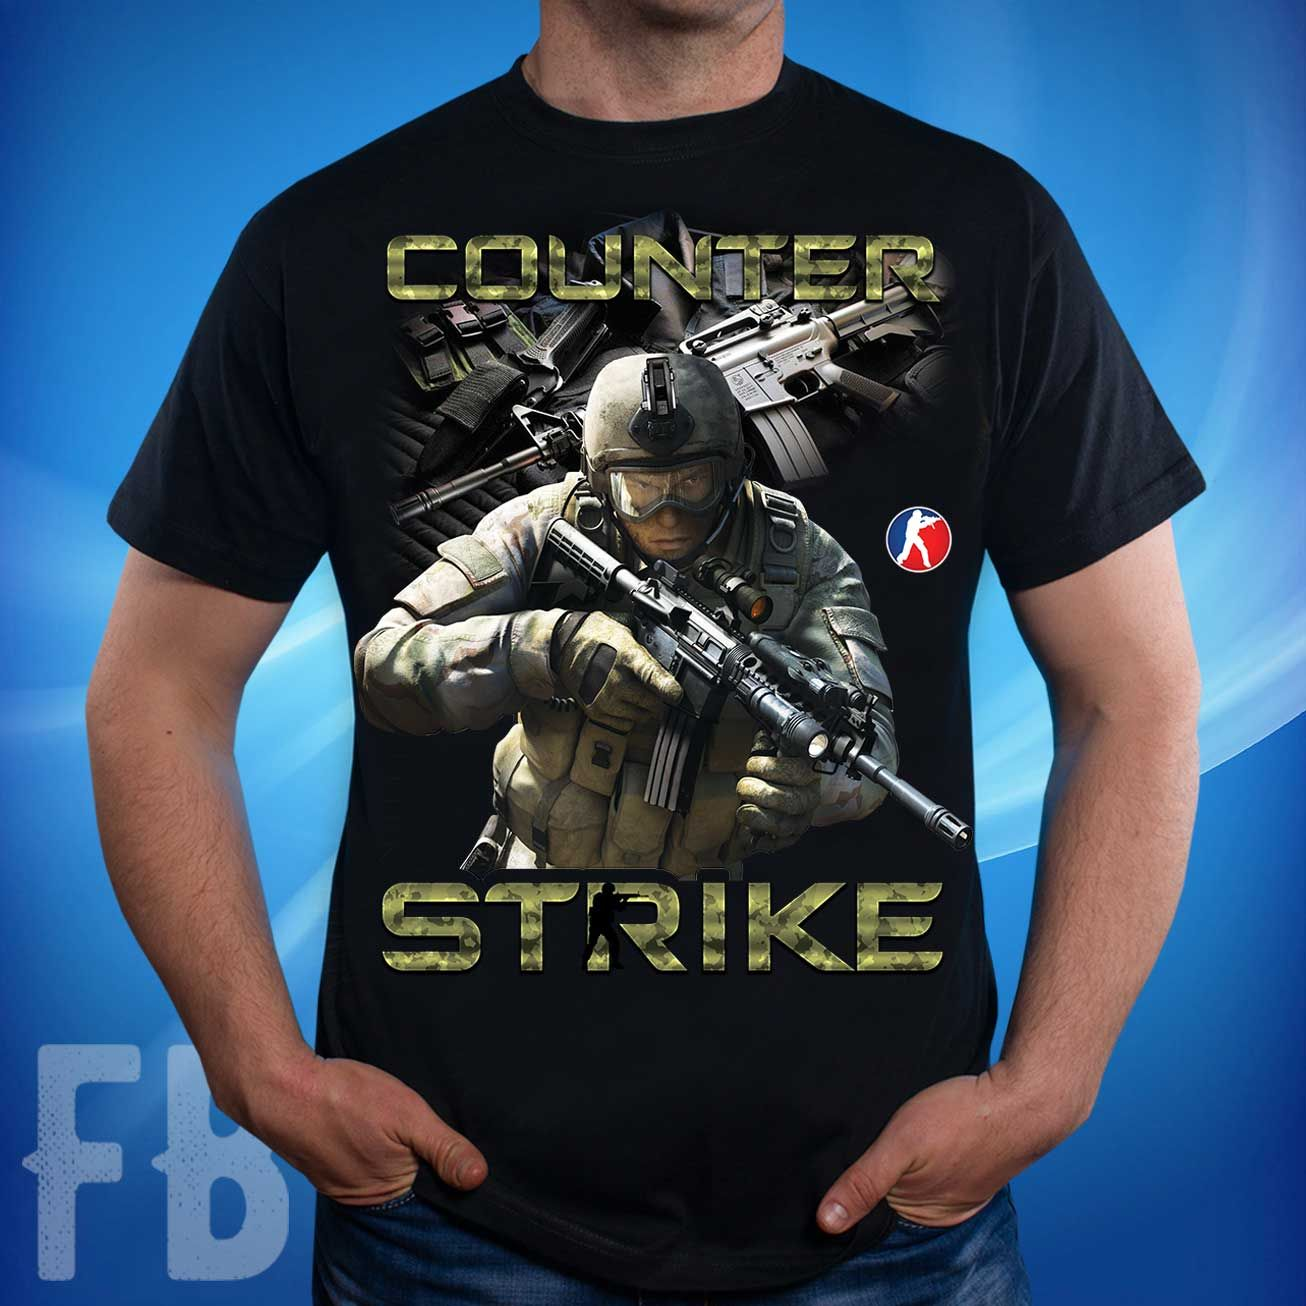 d9d23a353b3 Мужская футболка с изображением сюжета из игры Counter Strike грн. Размеры   S